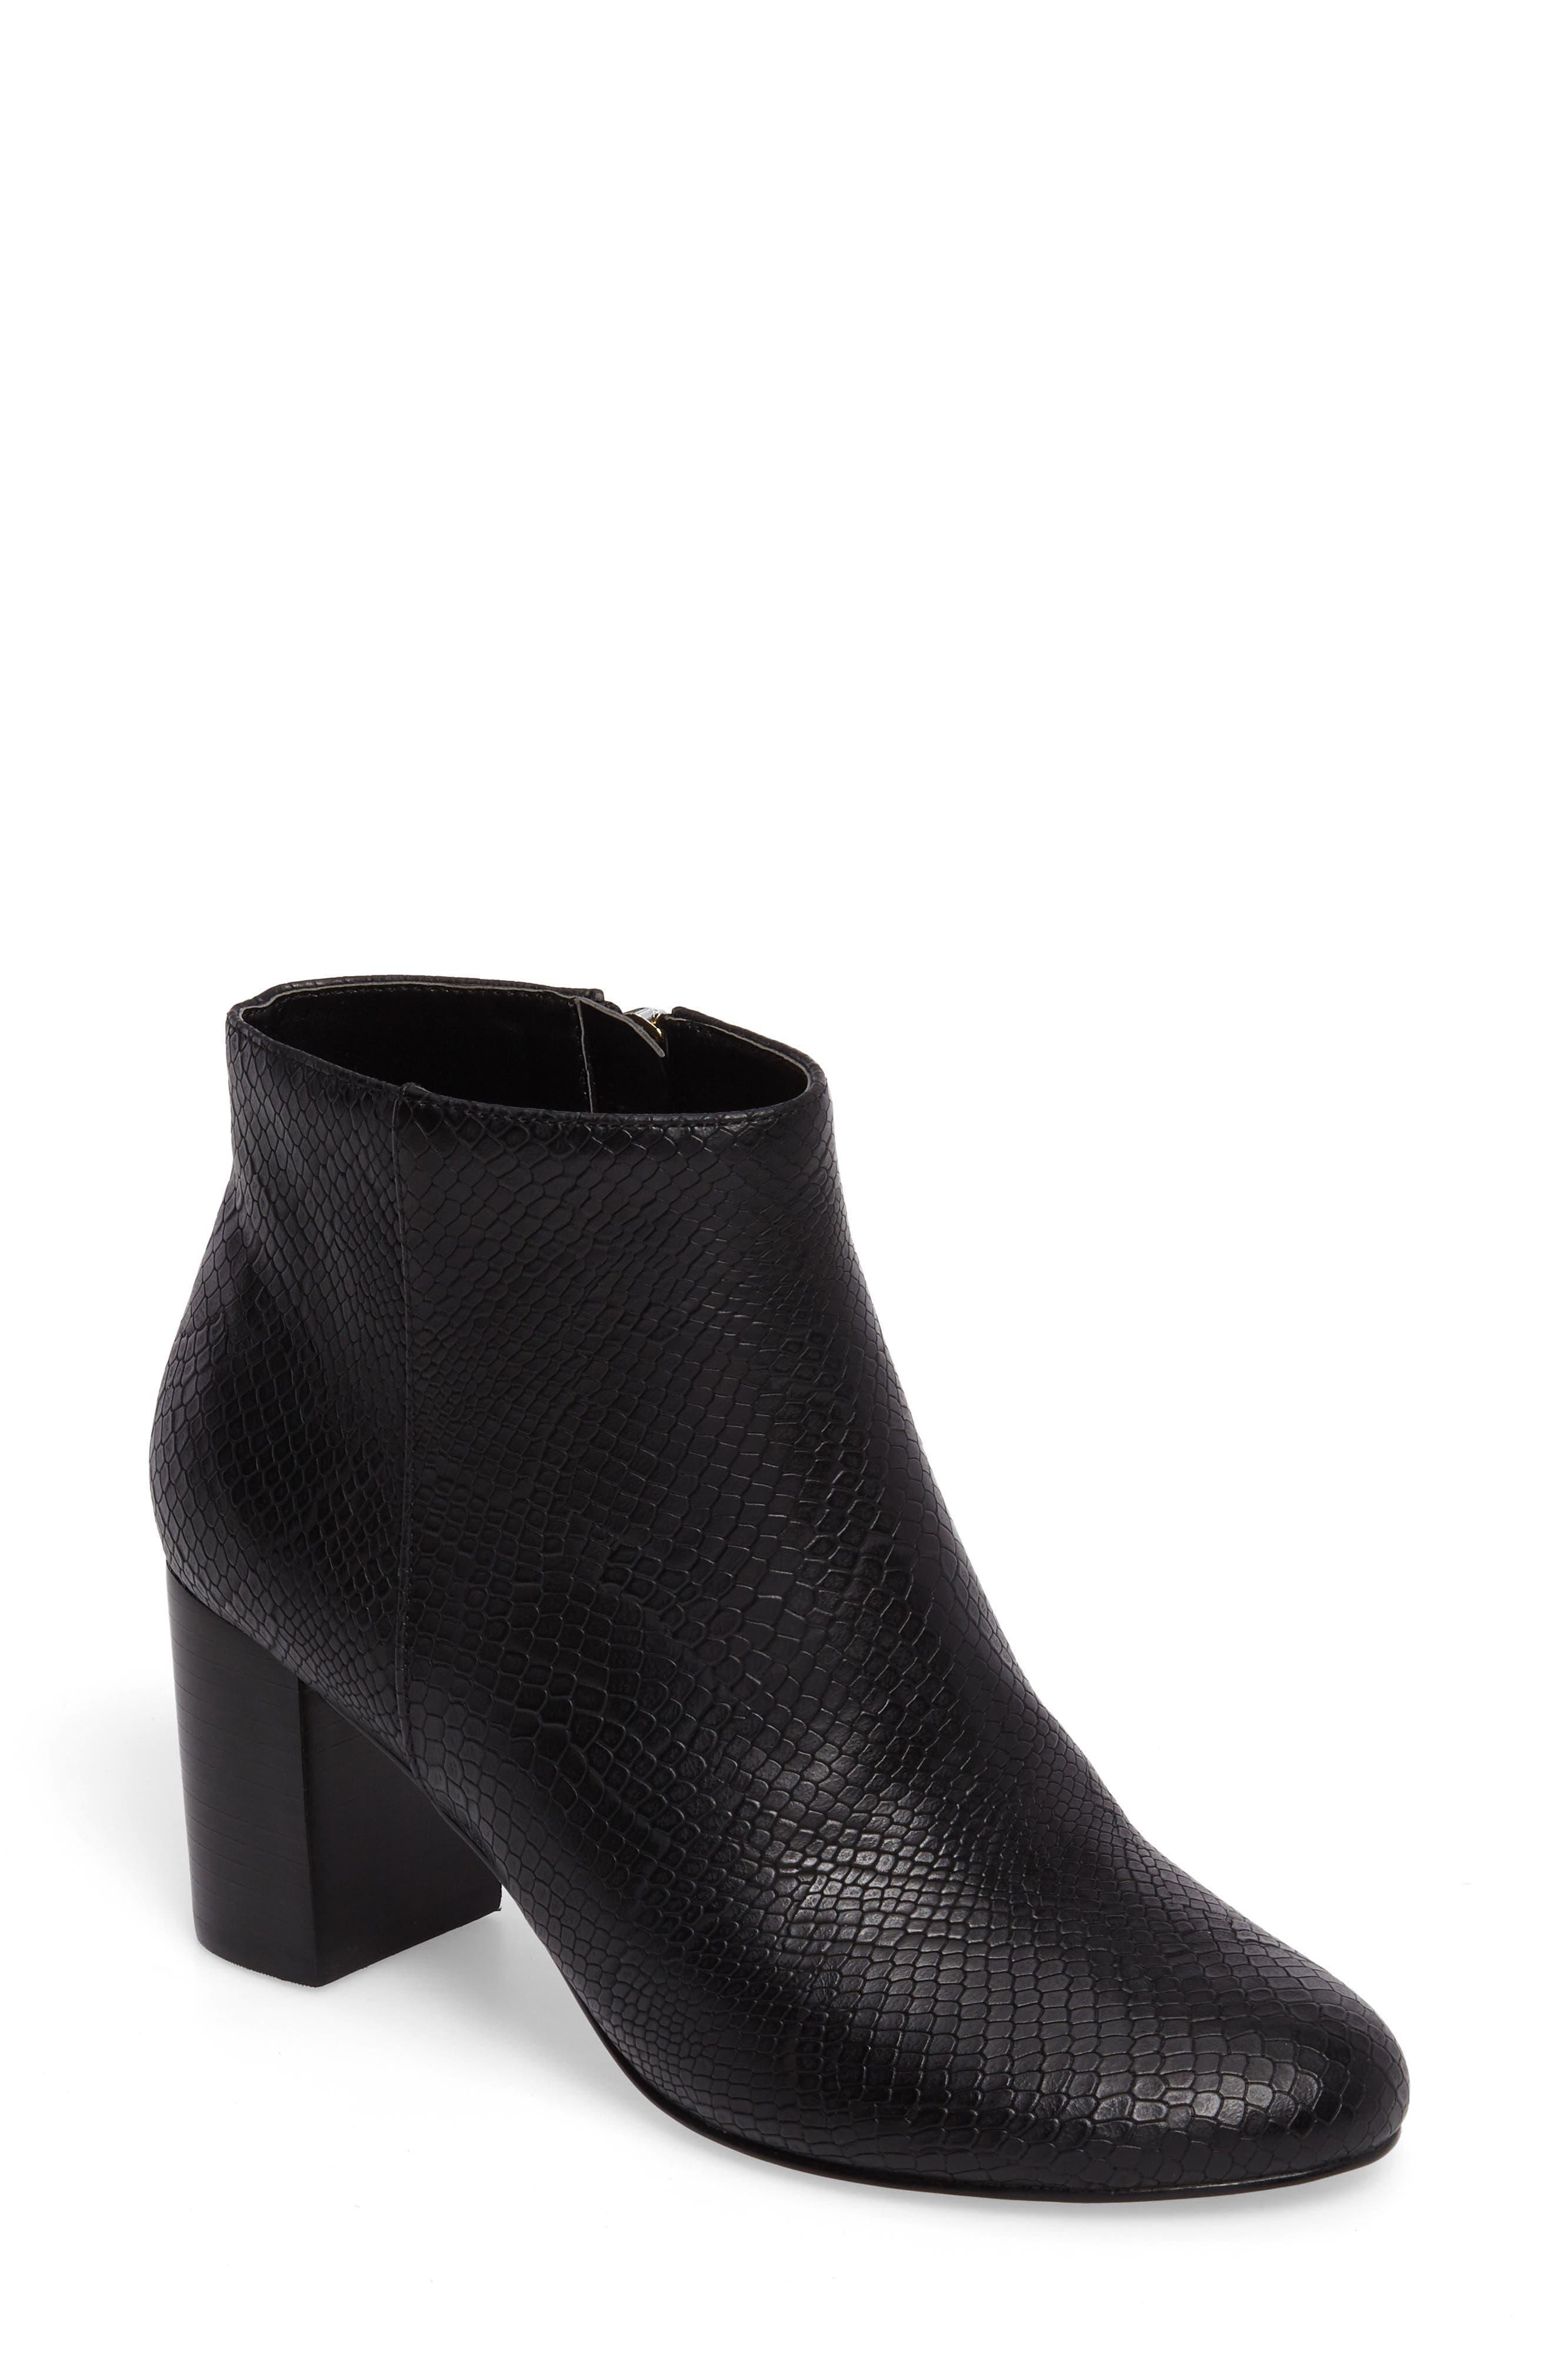 Klaudia II Block Heel Bootie,                             Main thumbnail 1, color,                             Black Printed Leather